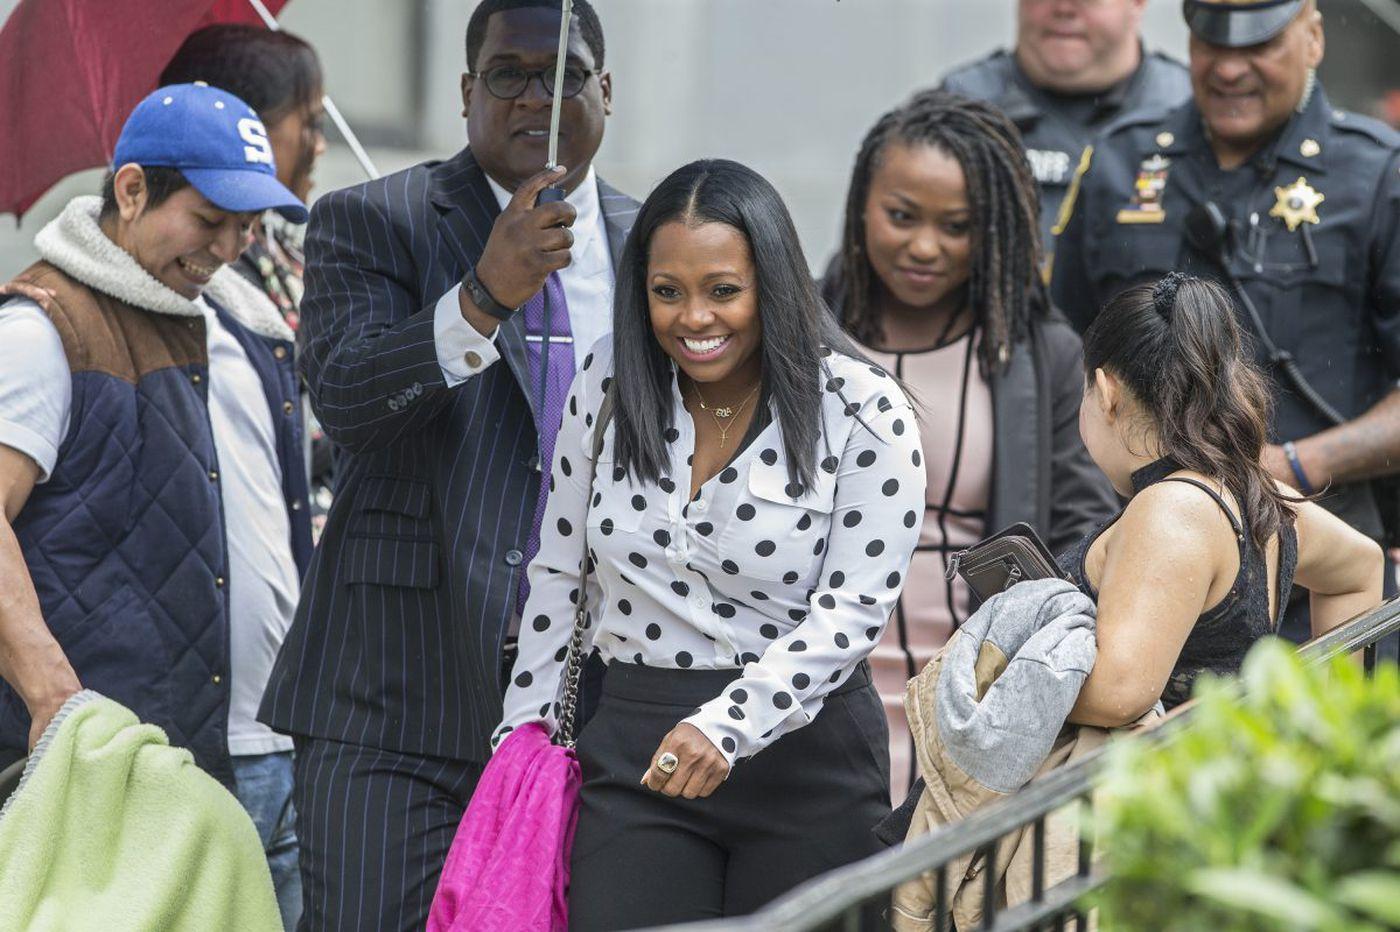 Why I wish 'Rudy' had skipped Cosby's trial